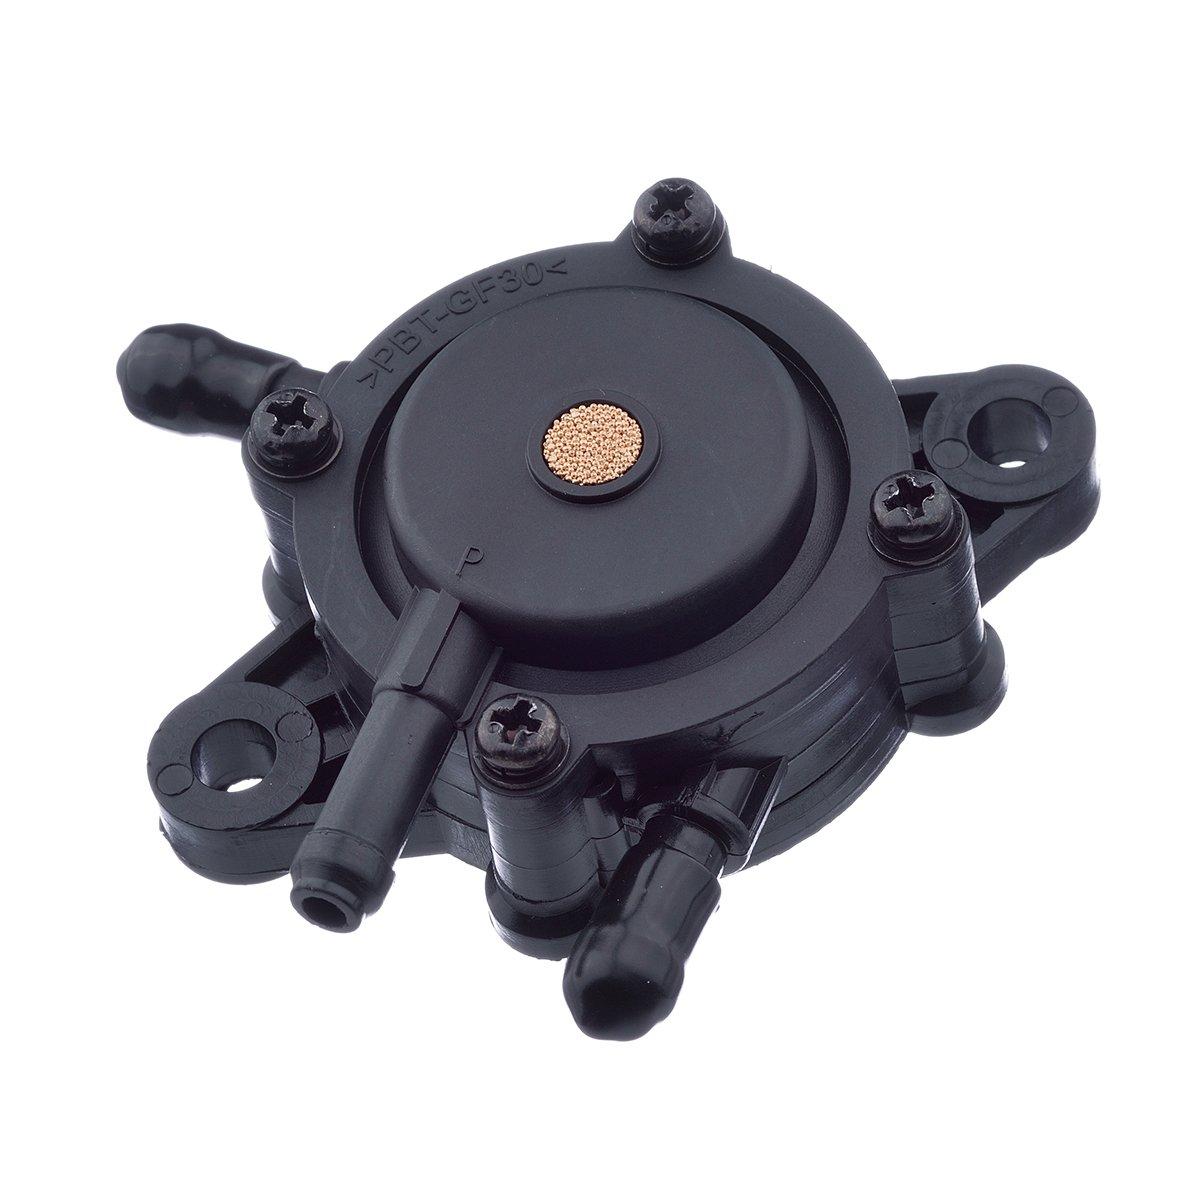 HONDA 16700-ZL8-013 John Deere Lg808656 M138498 M145667 Kohler 24 393 04S 24393 16S OuyFilters Fuel Pump for Briggs /& Stratton 491922 808656 Kawasaki 49040-7001